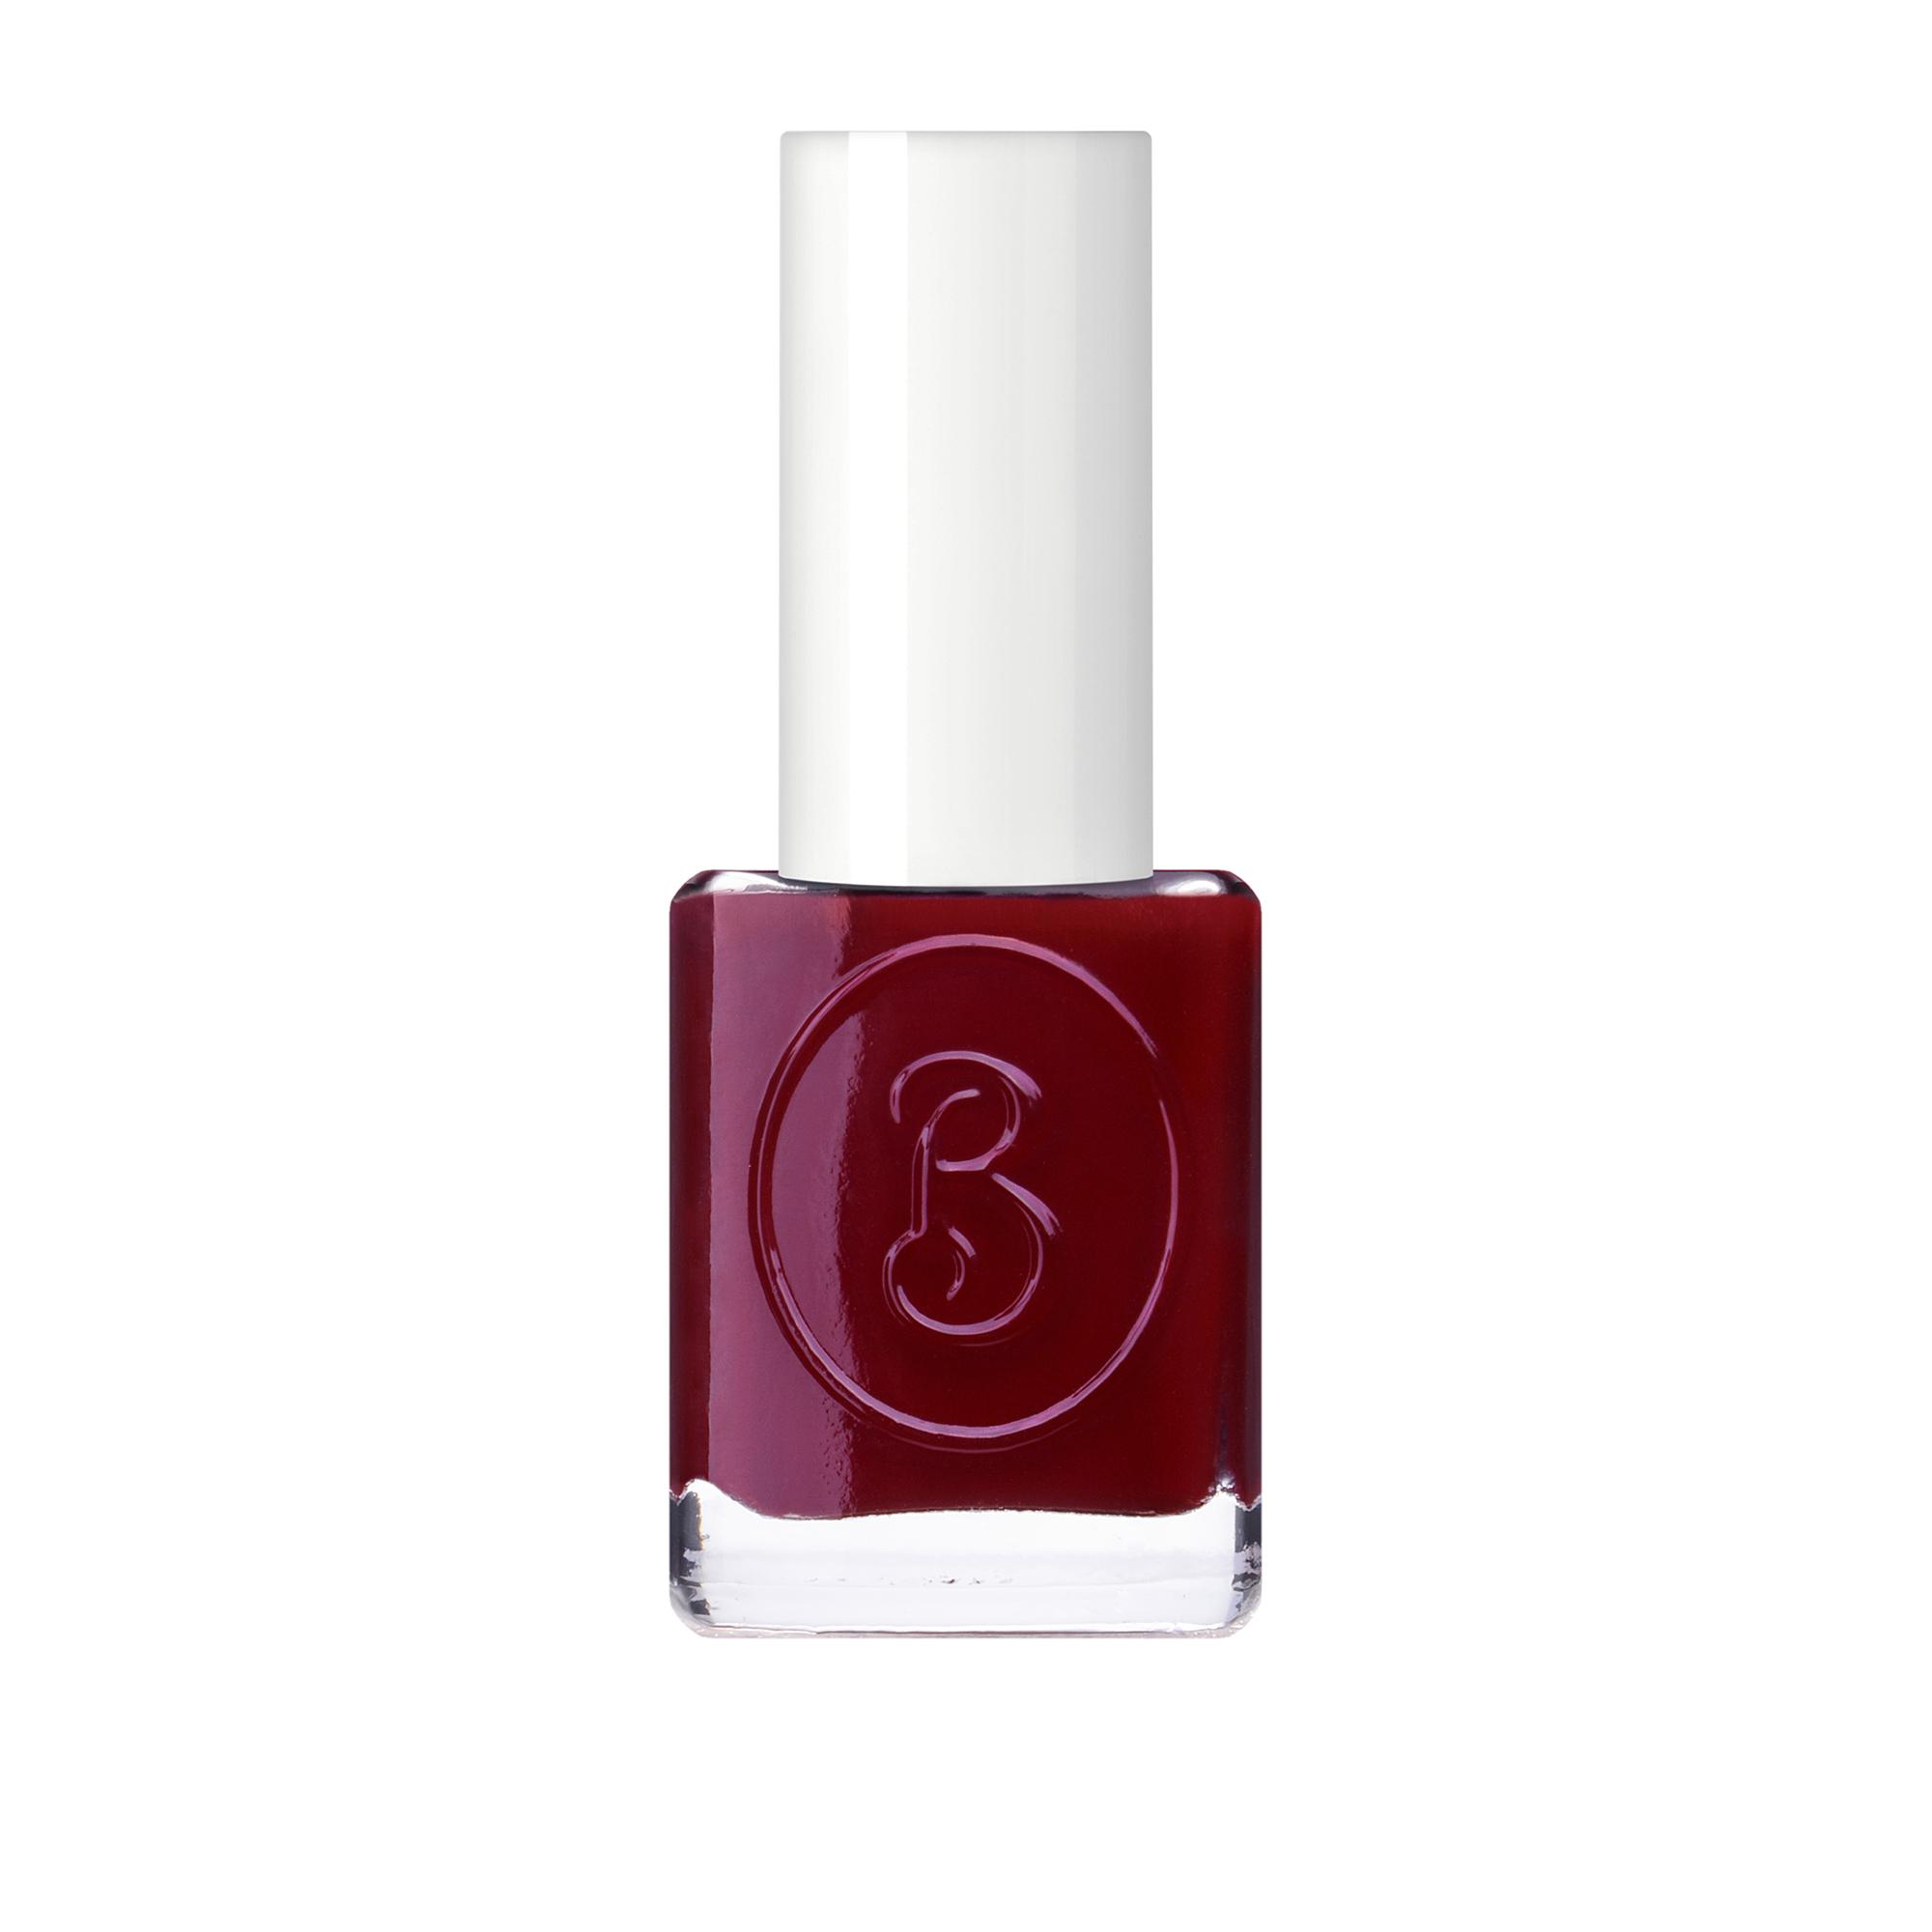 BERENICE 09 лак для ногтей, темно красный / Dark red 16 мл berenice 13 лак для ногтей оранжево красный orange red 16 мл